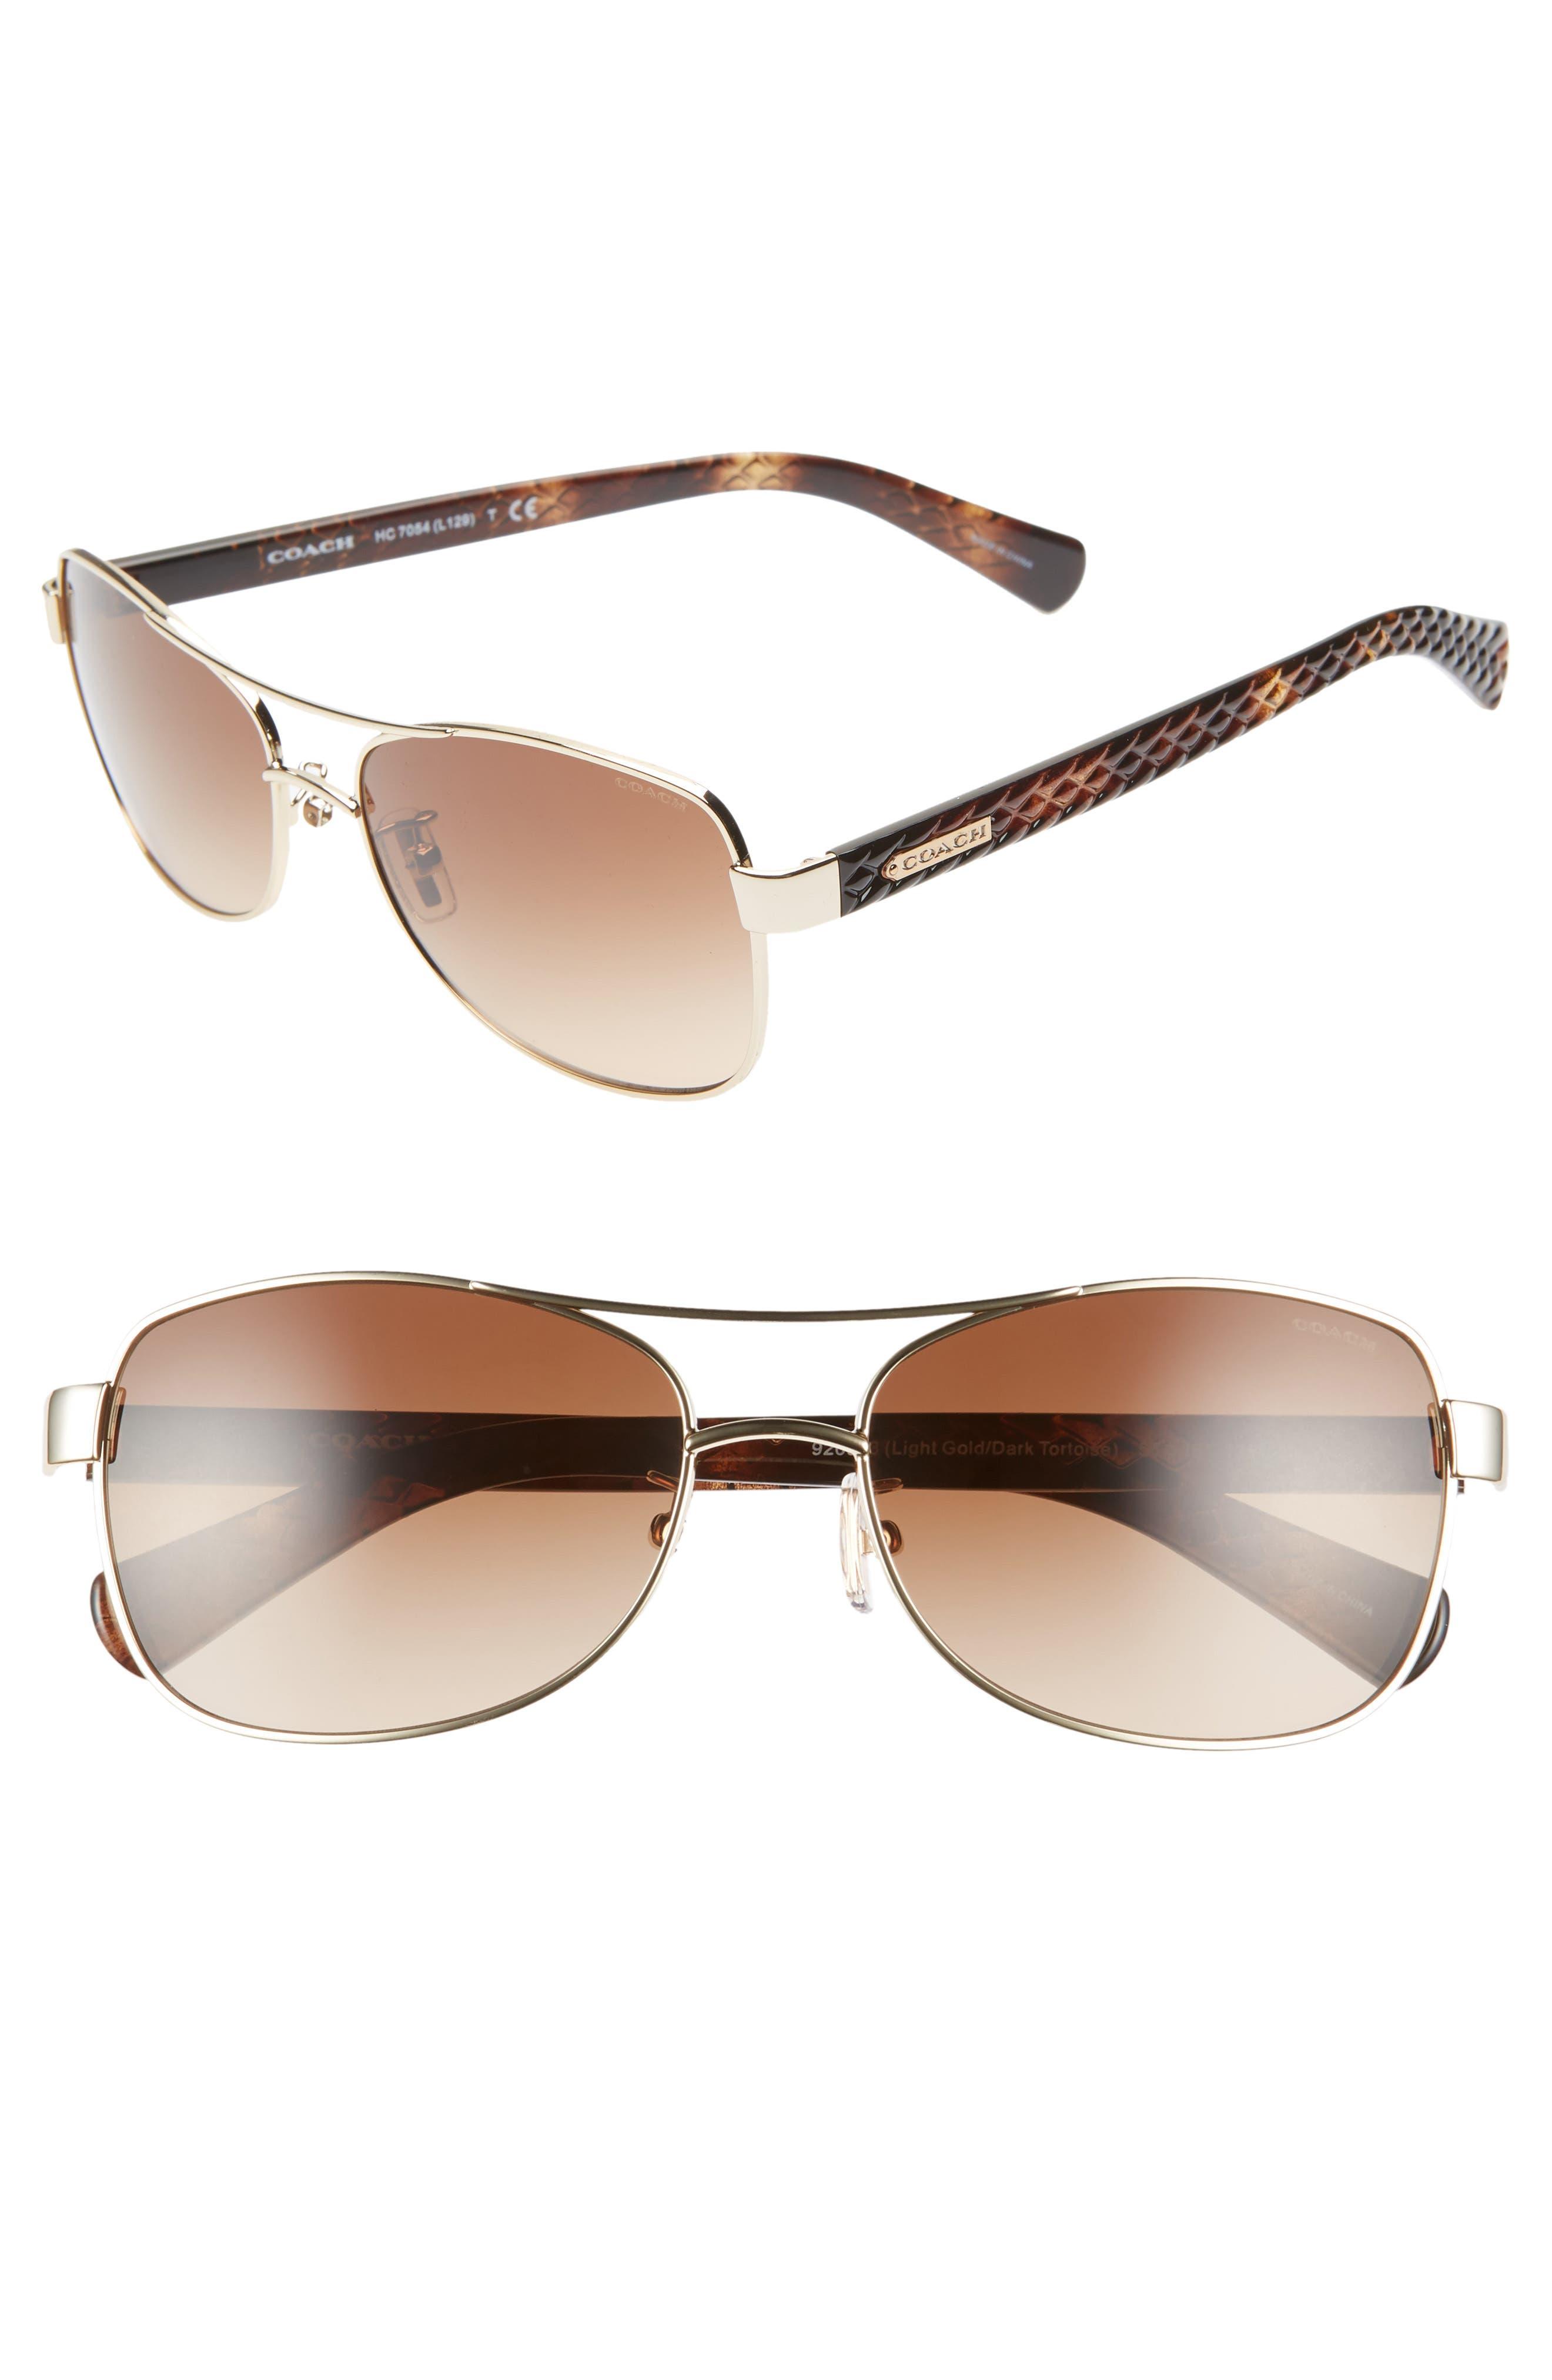 17452ae2389f Women's Coach 56Mm Aviator Sunglasses - Gold/ Tortoise Gradient